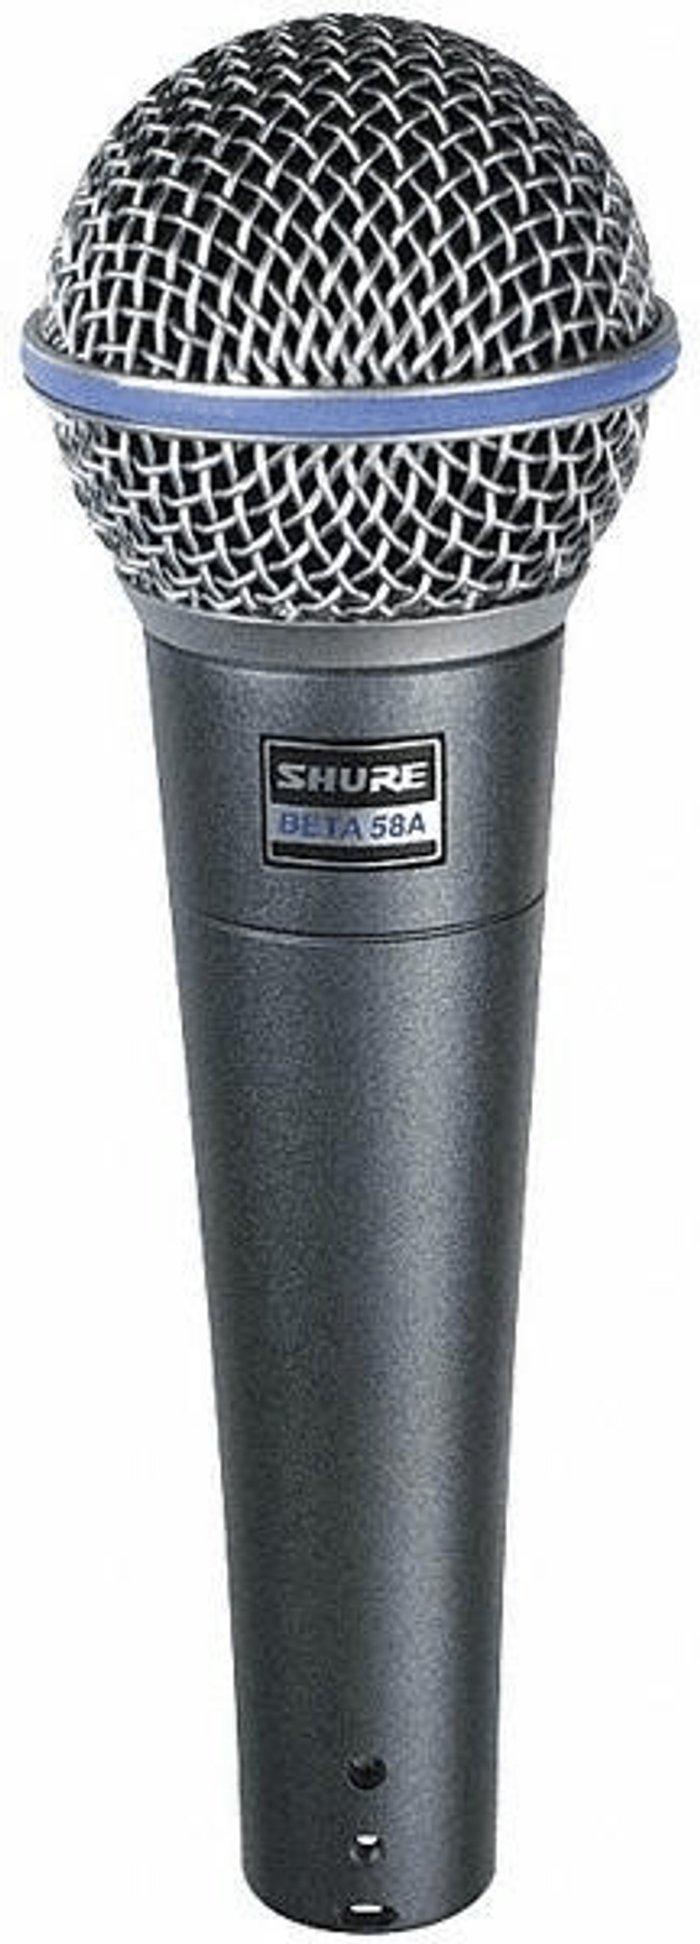 Shure Shure Beta 58 A